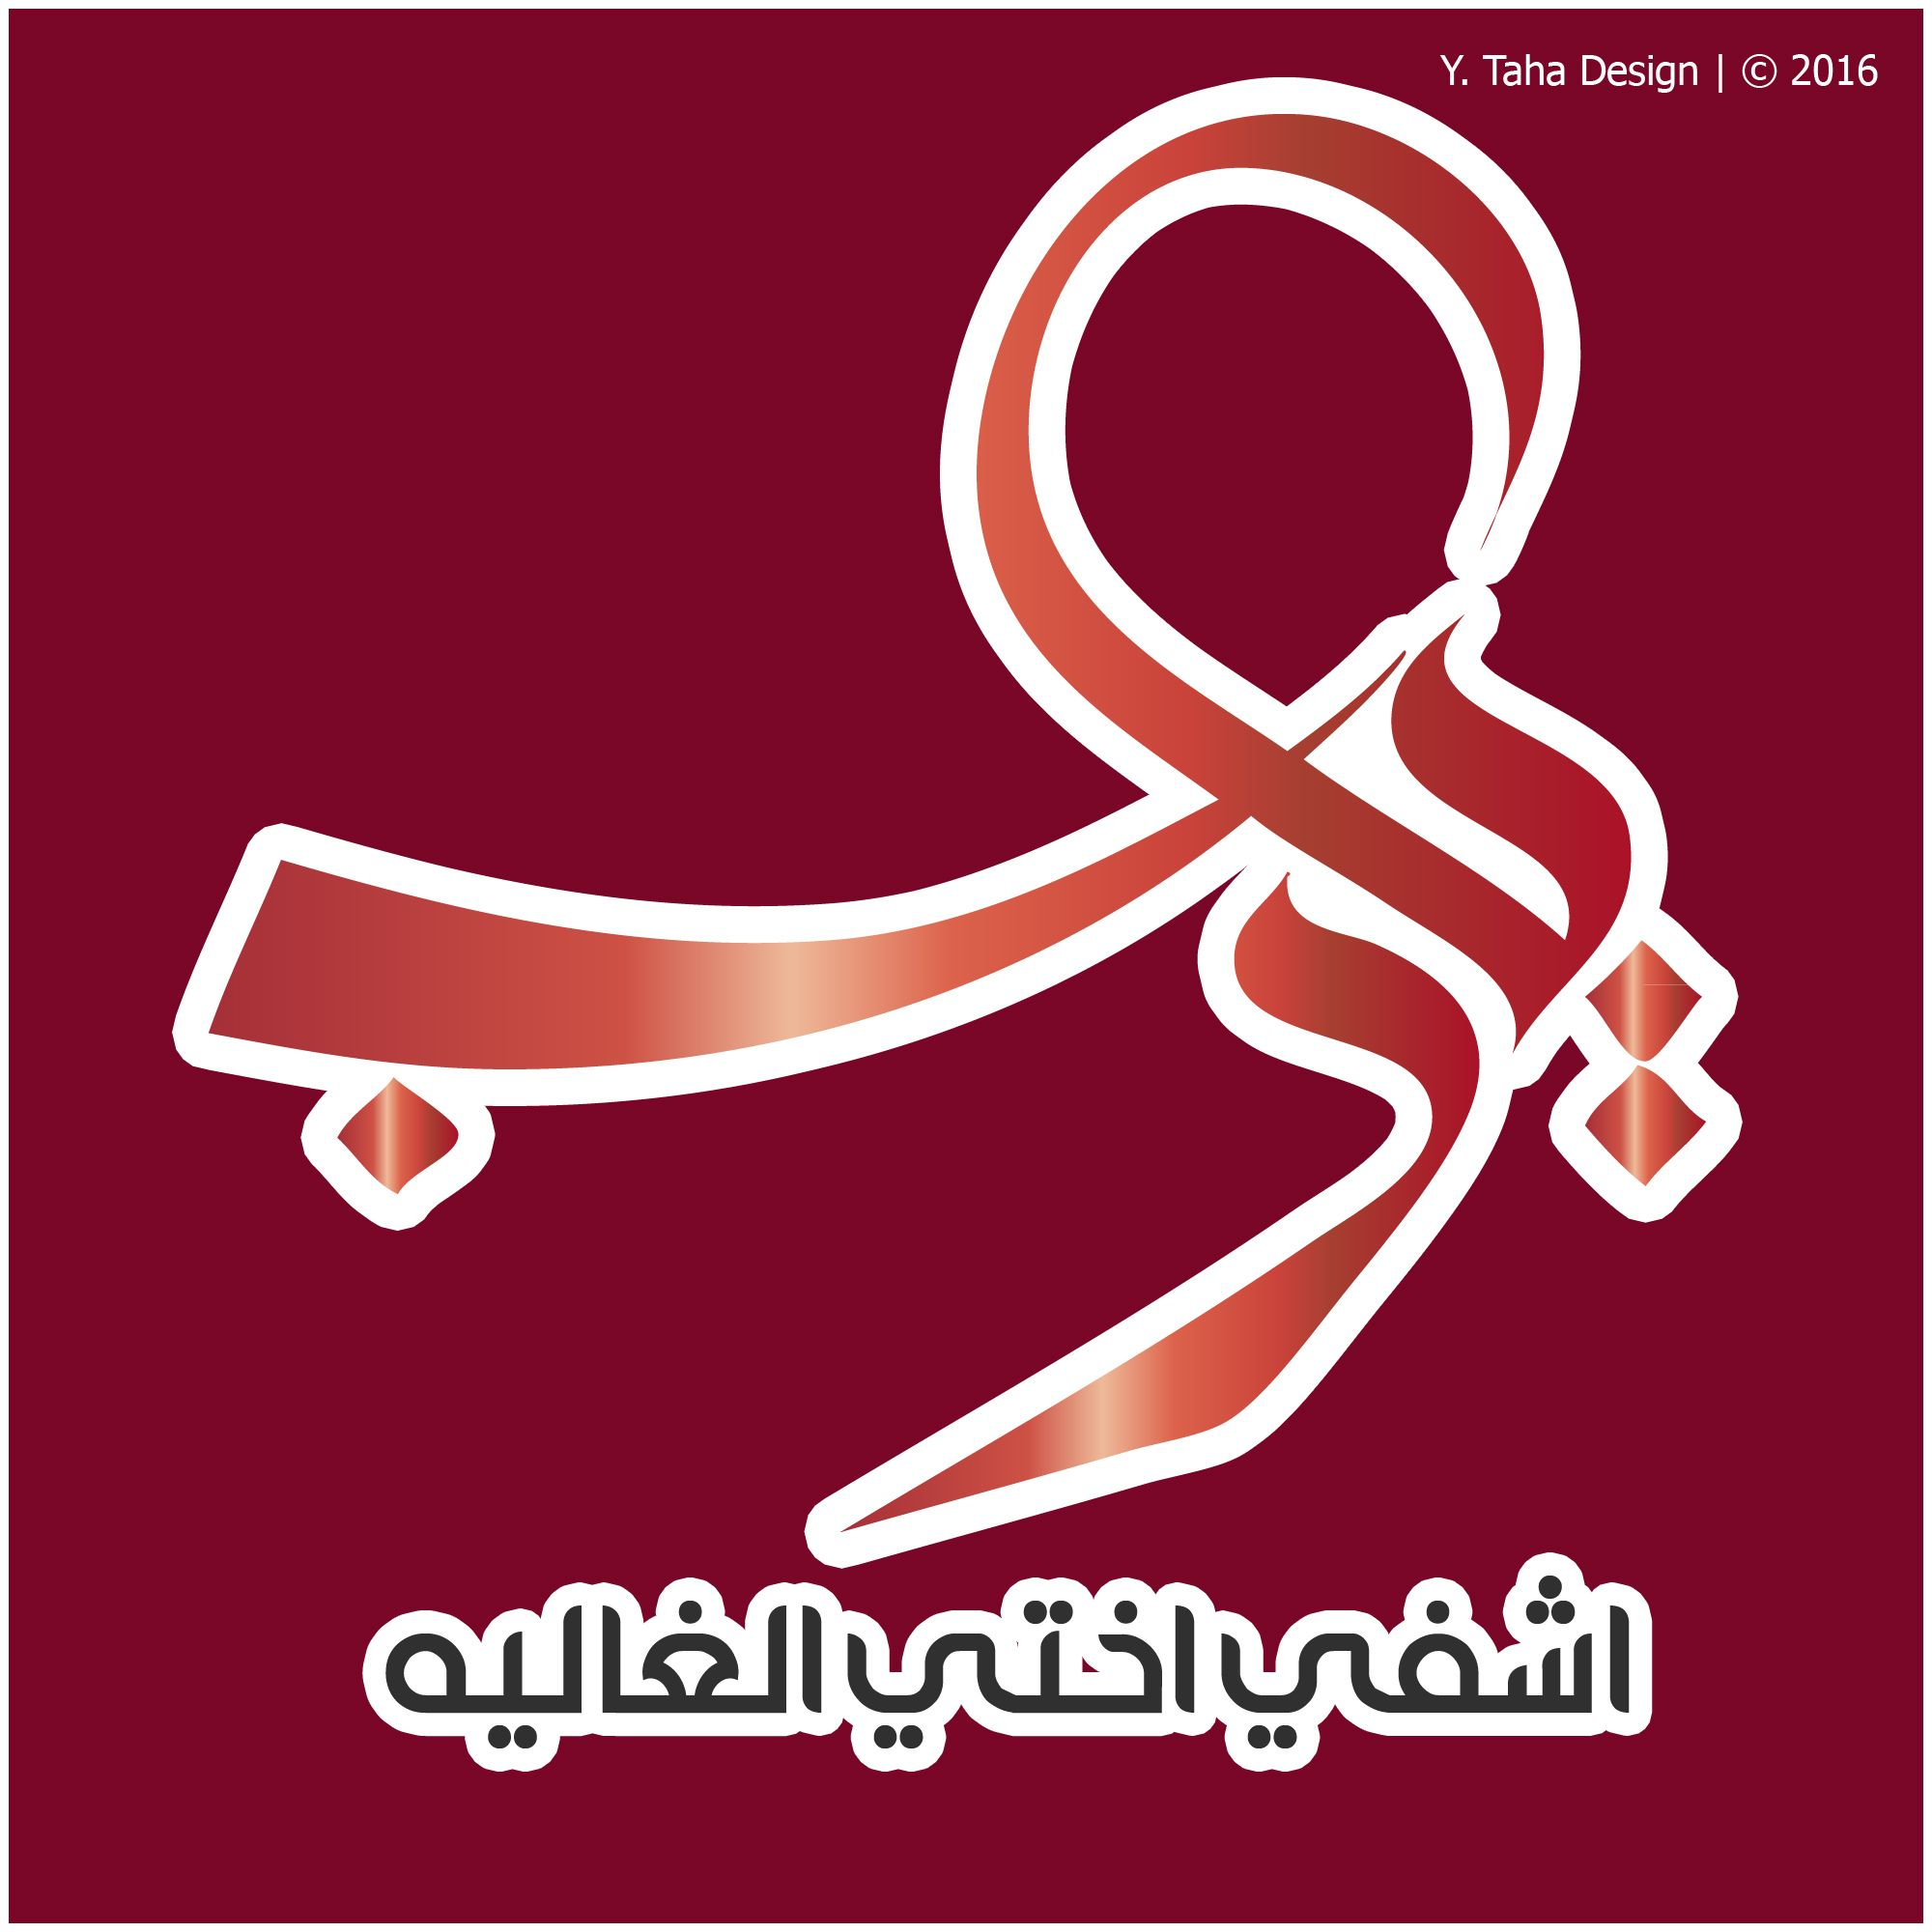 يارب اشفي اختي الغاليه Symbols Letters Design